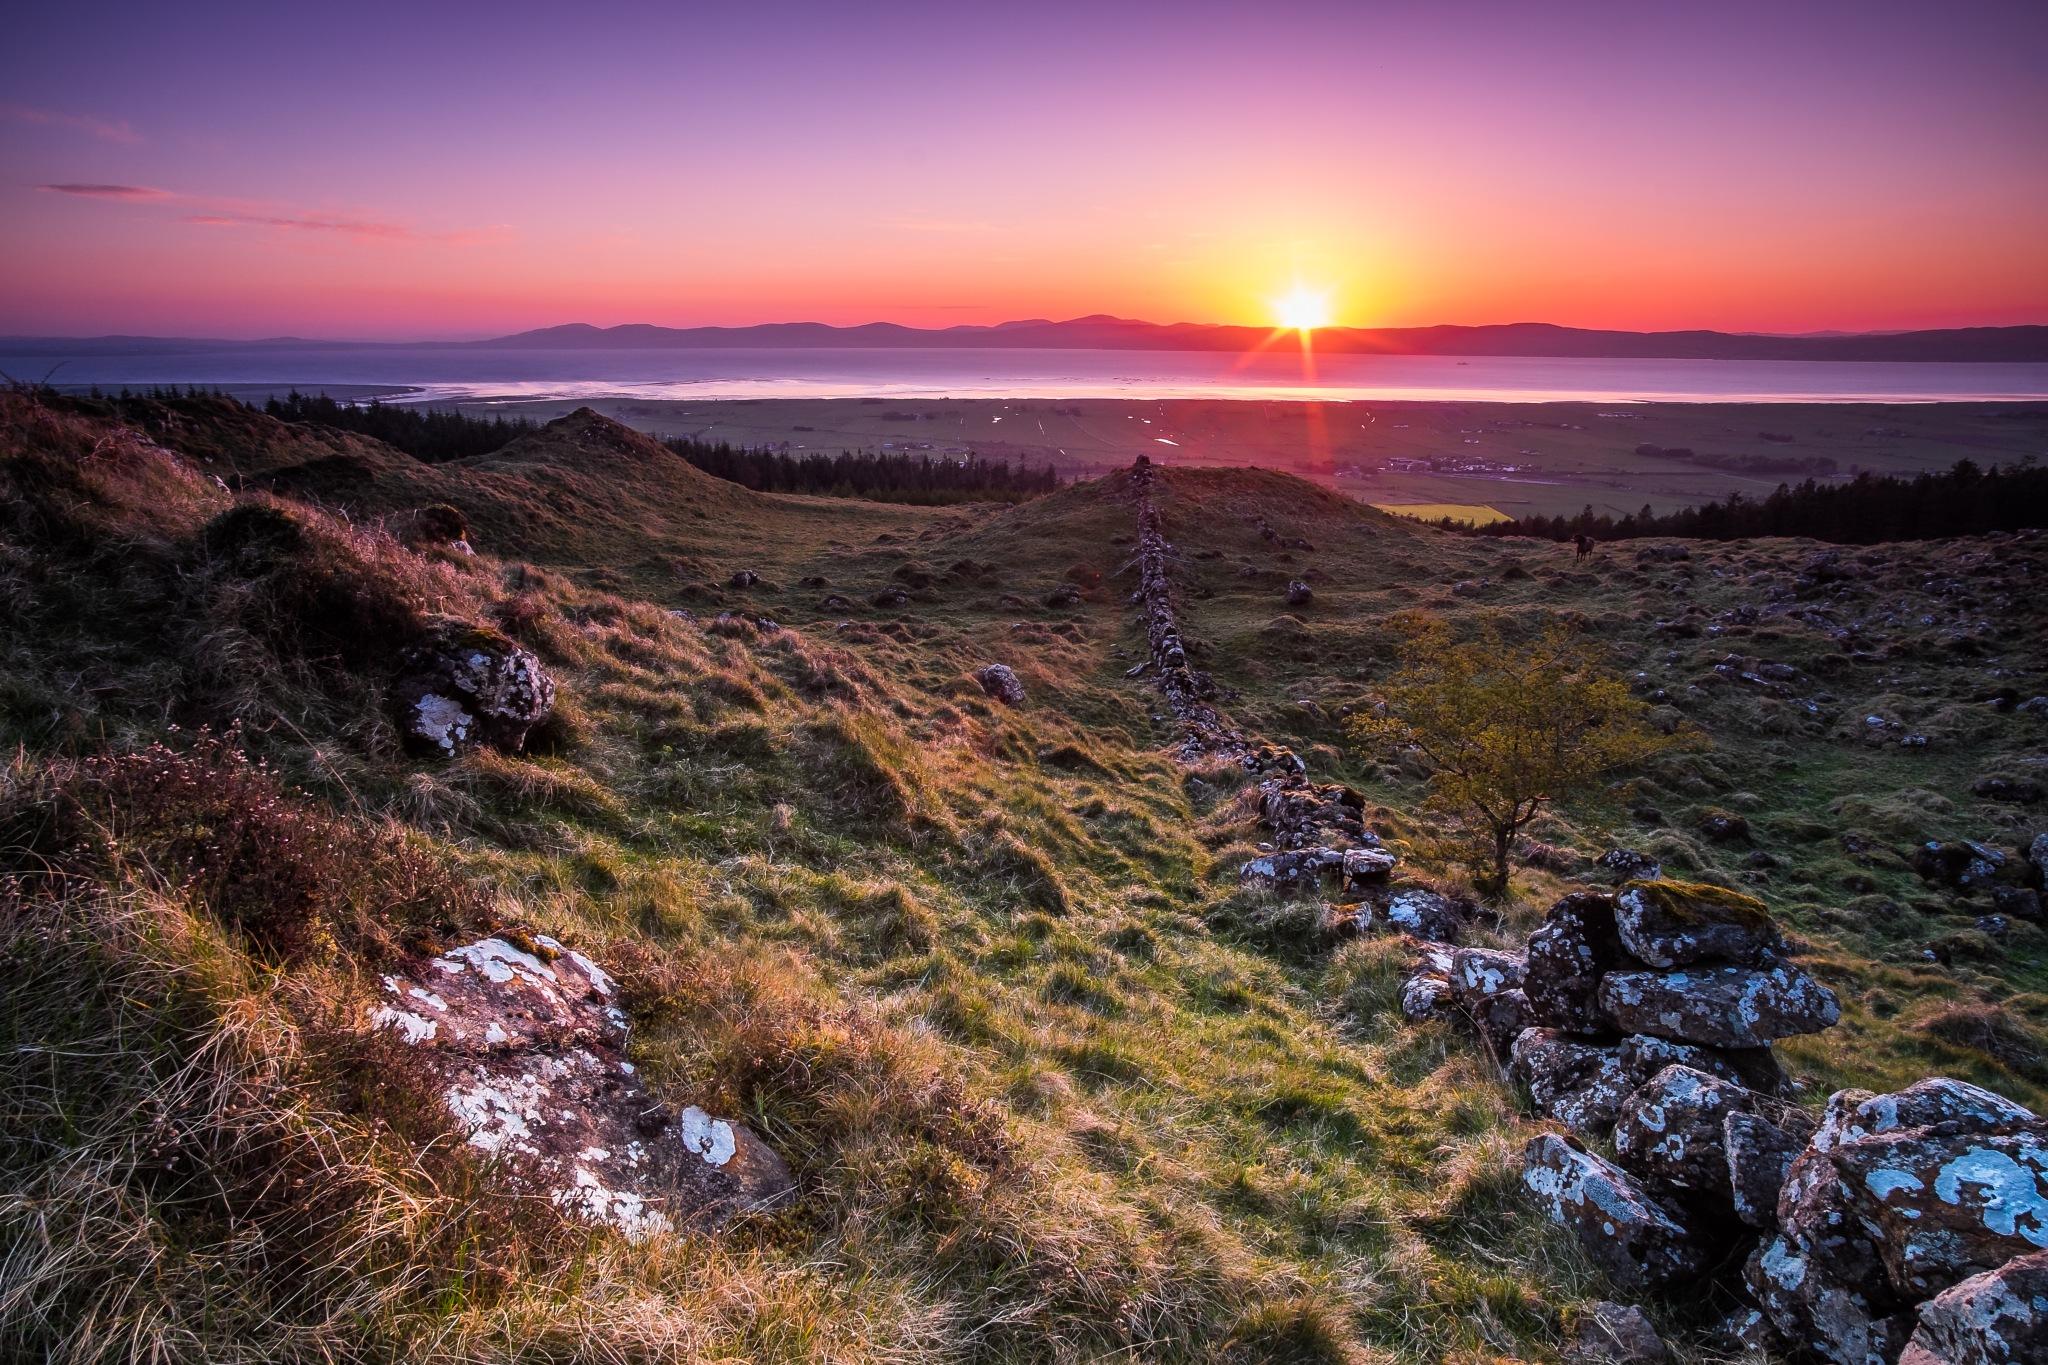 Binevenagh sunset by Lee Morrow